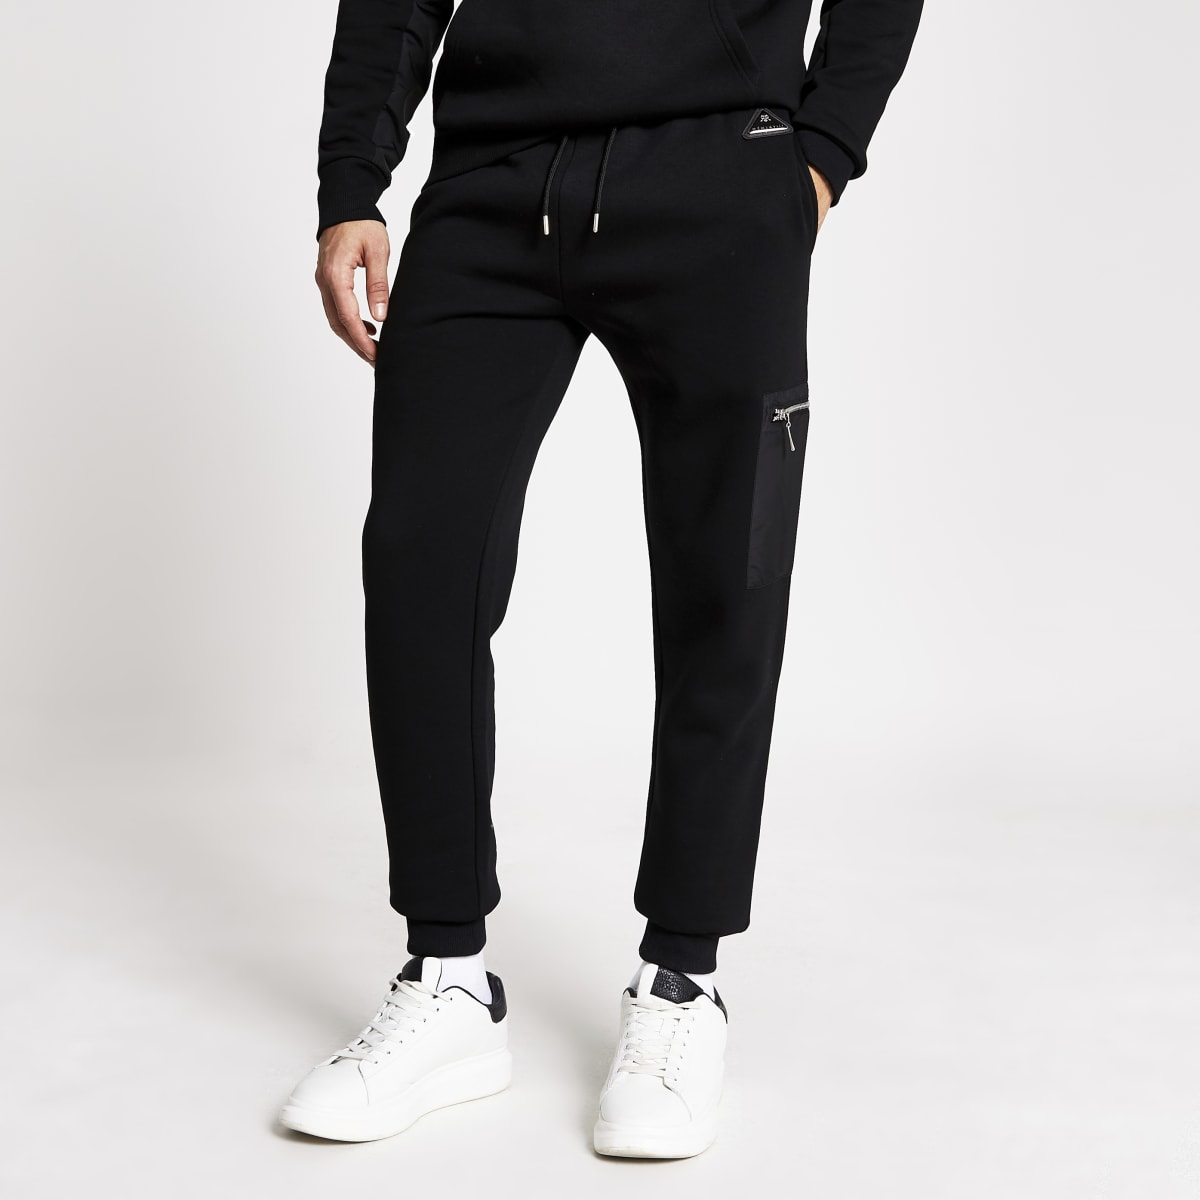 MCMLX black nylon slim fit joggers